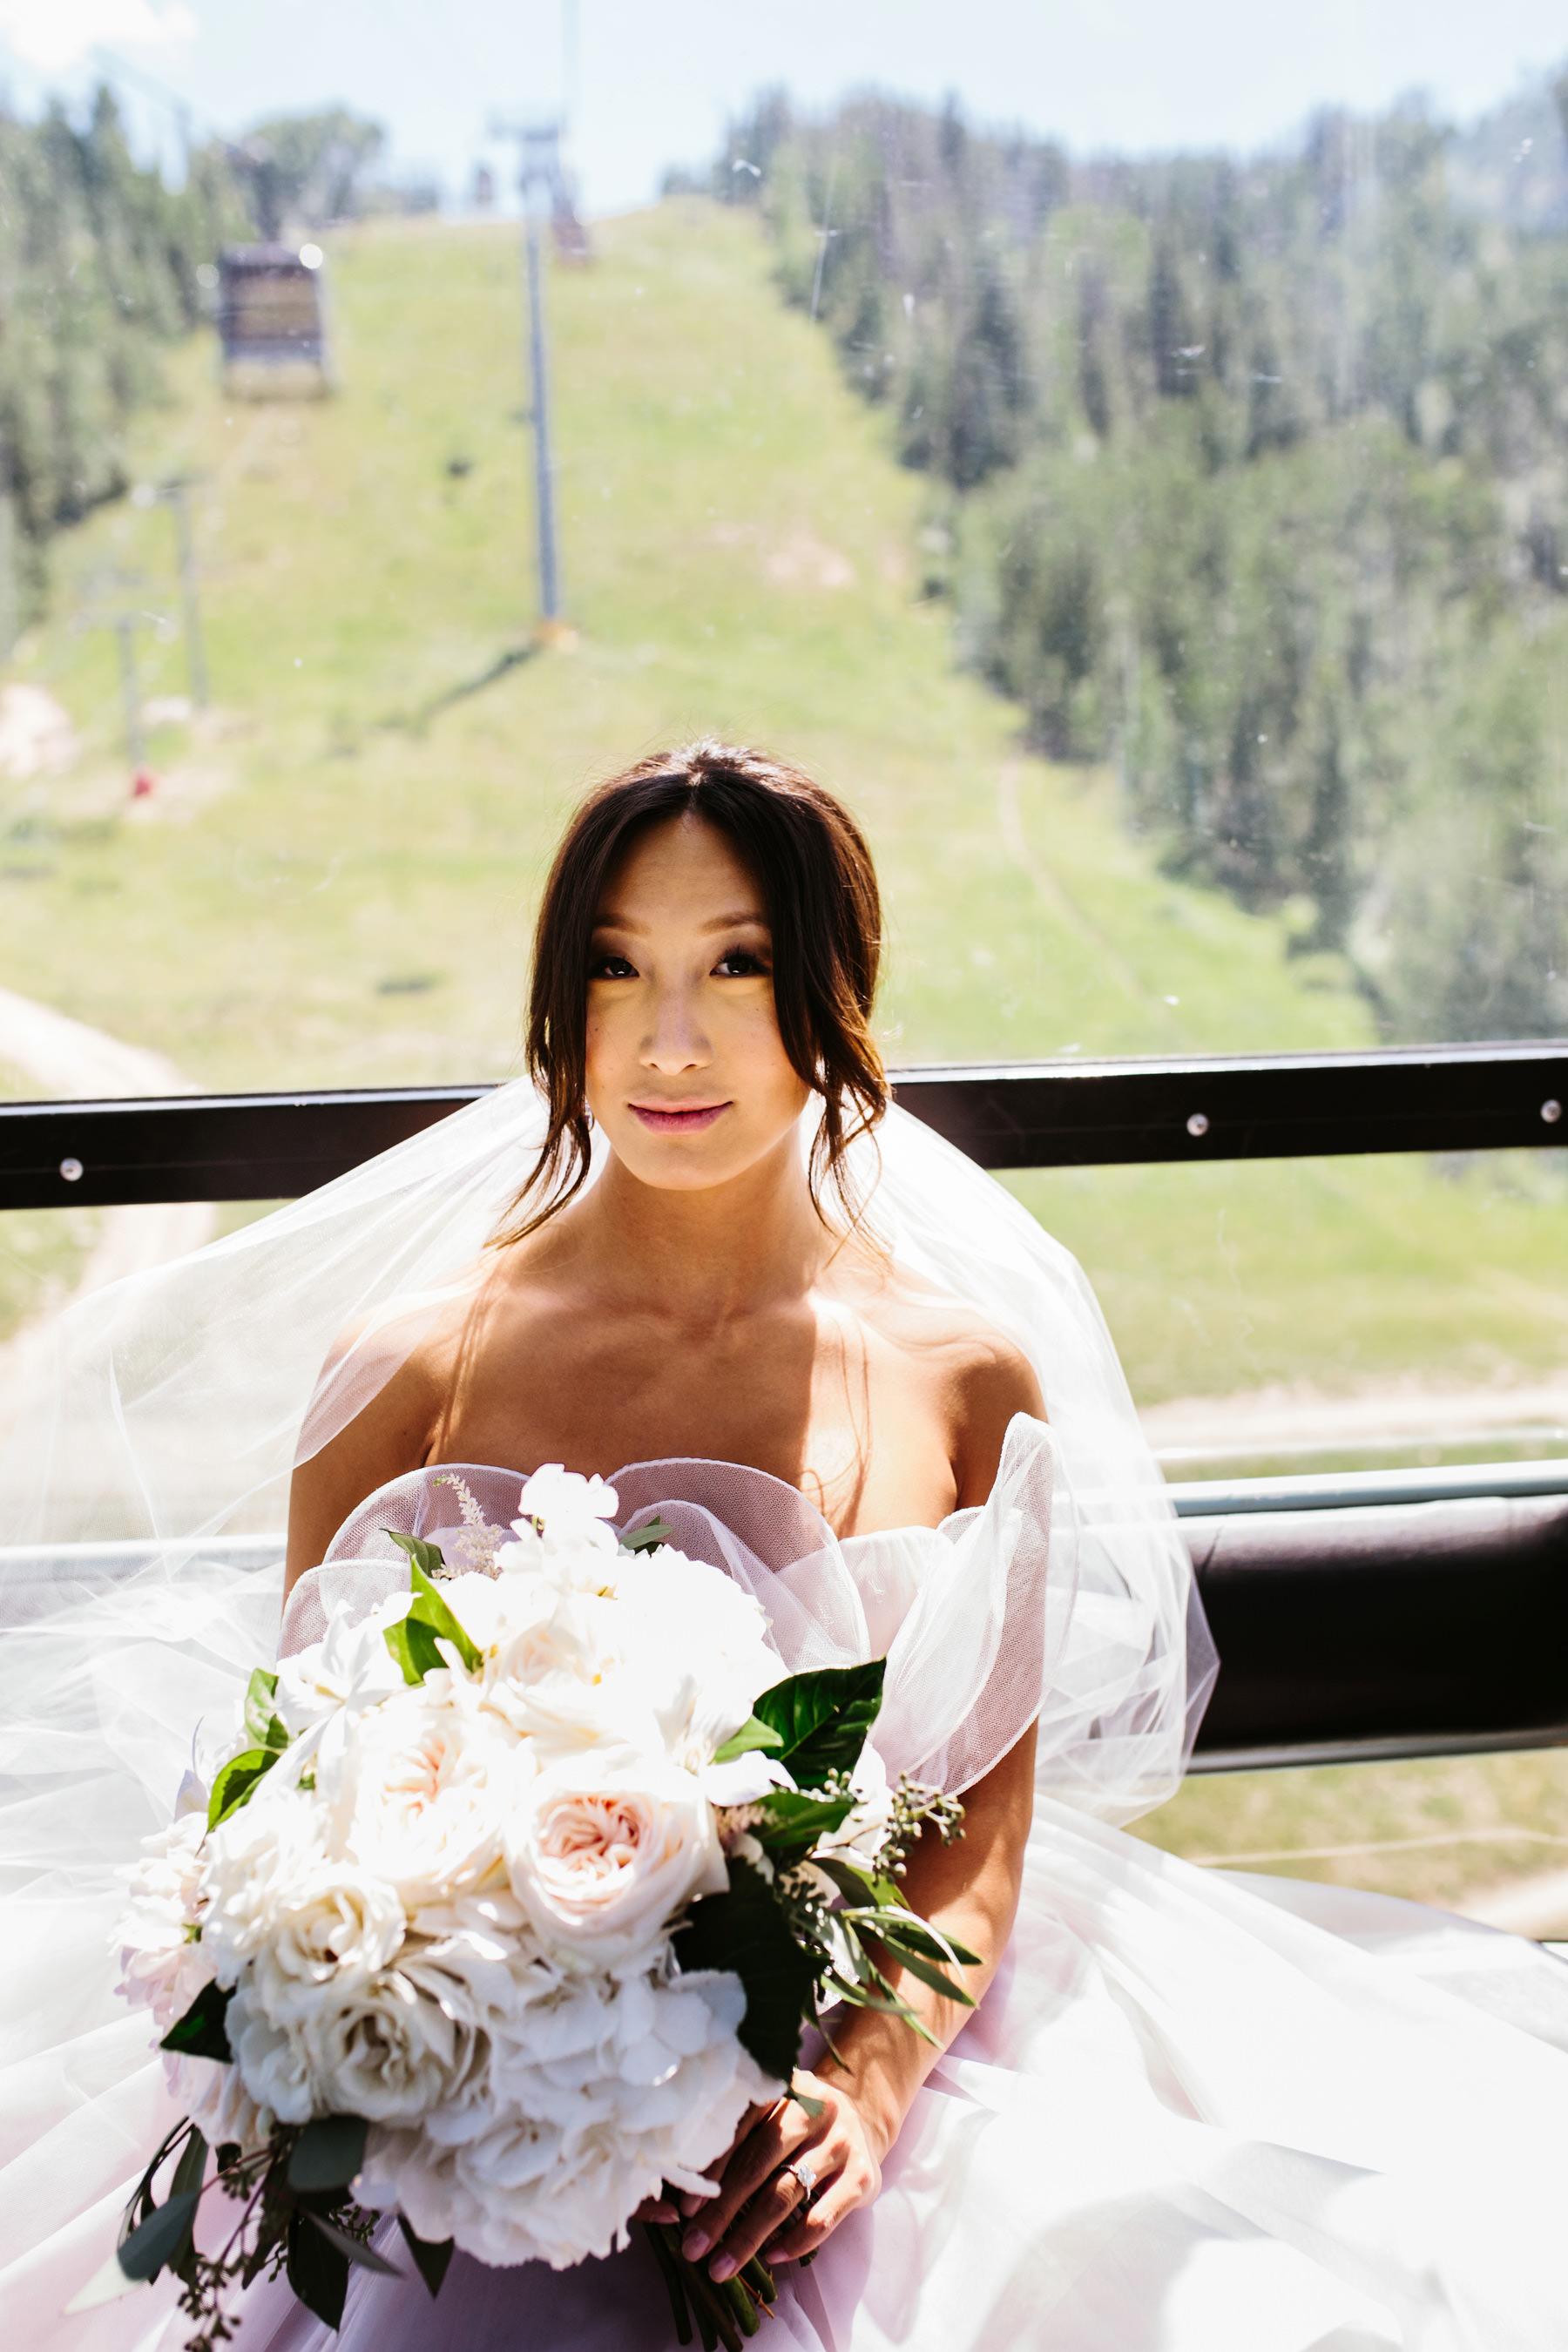 Vail Colorado Wedding Deck_ Kindling Wedding Photography15.JPG